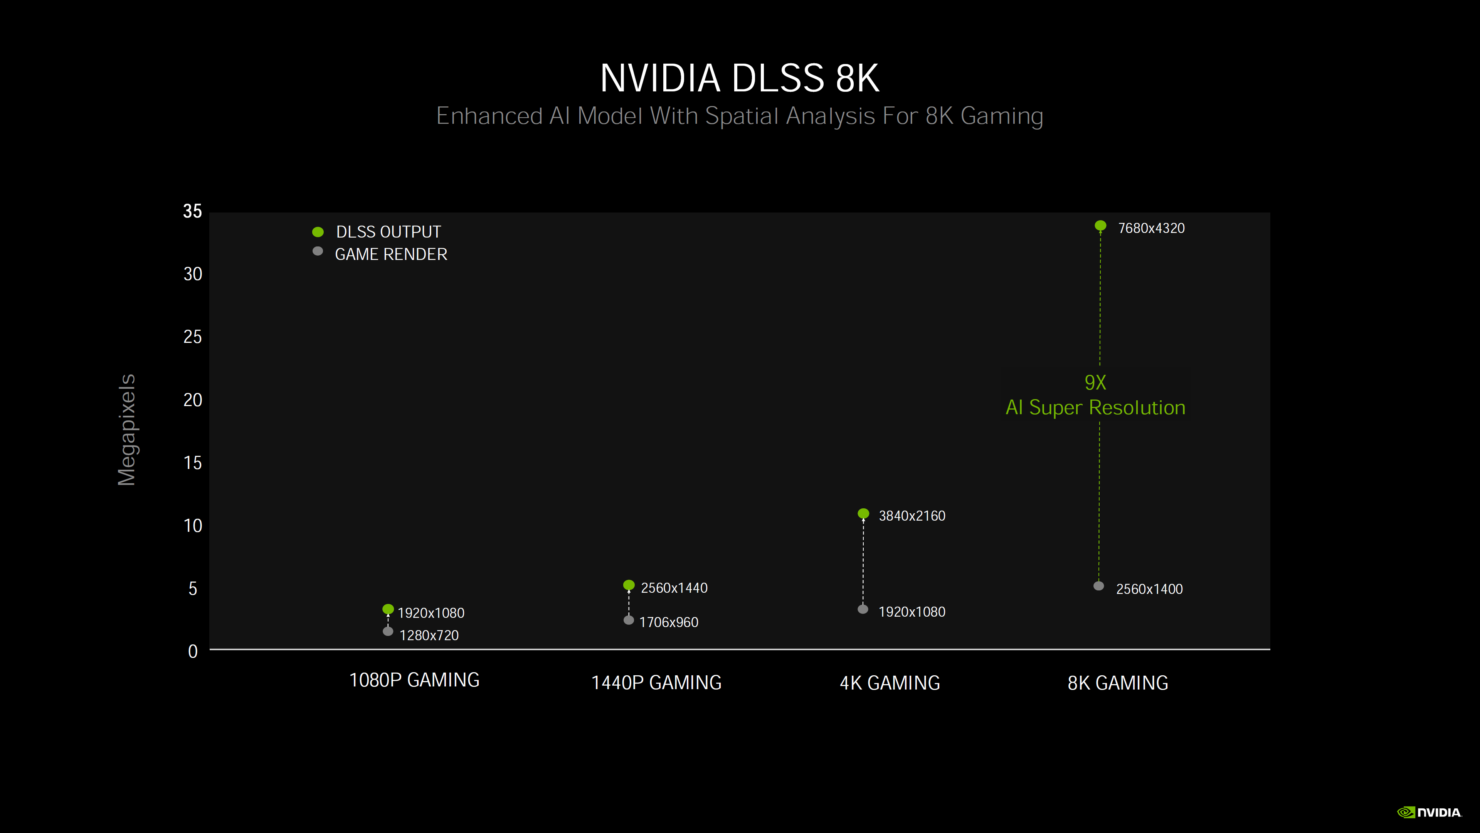 nvidia-geforce-rtx-30-series-deep-dive_rtx-3080_rtx-3090_rtx-3070_ampere-ga102_ampere-ga104_gpu_graphics-cards_70